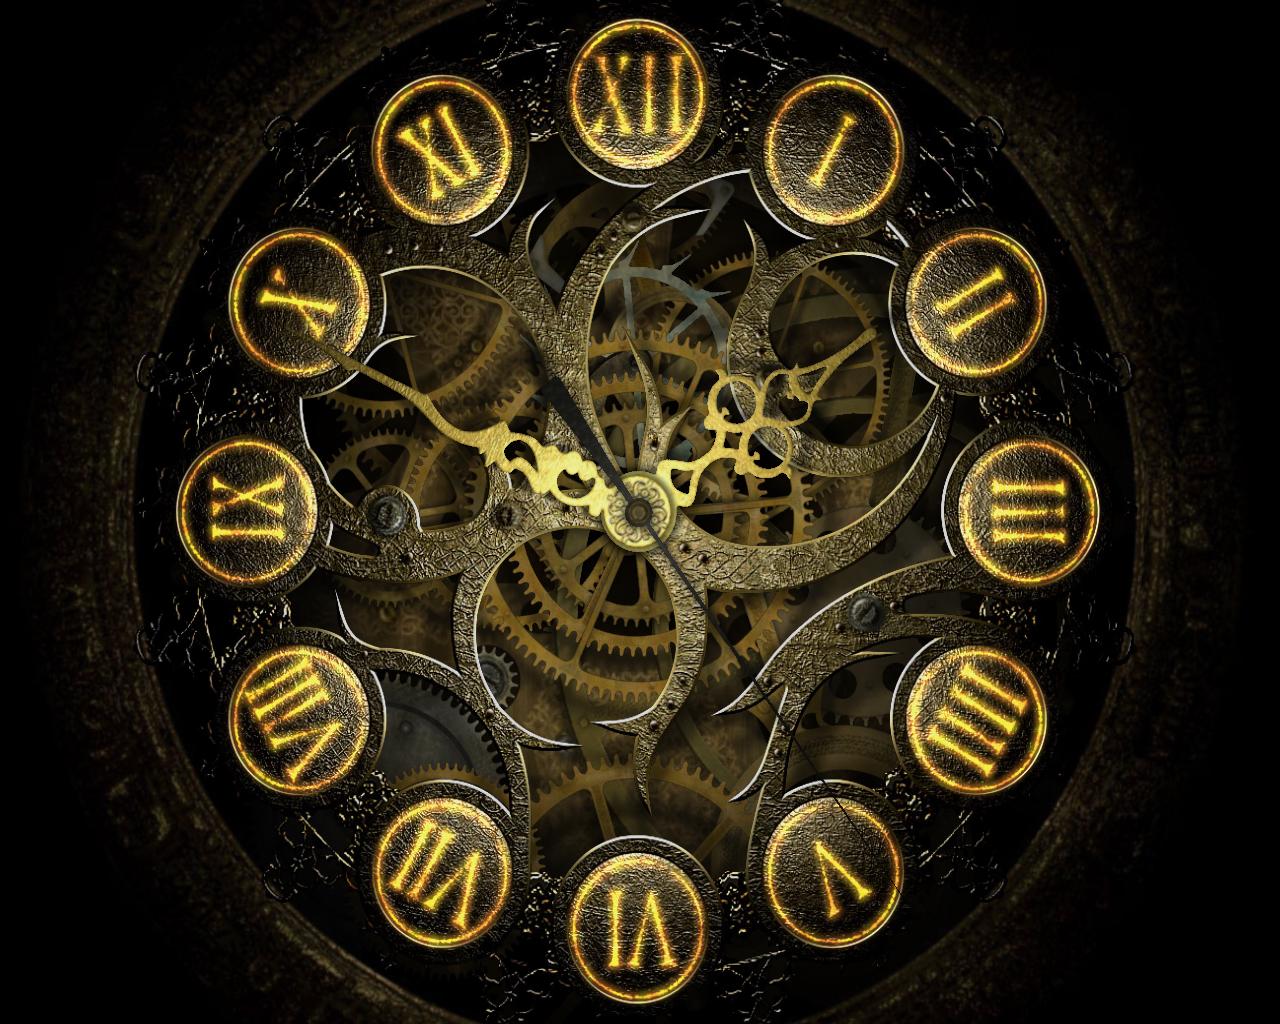 steampunk wallpaper clock - photo #7